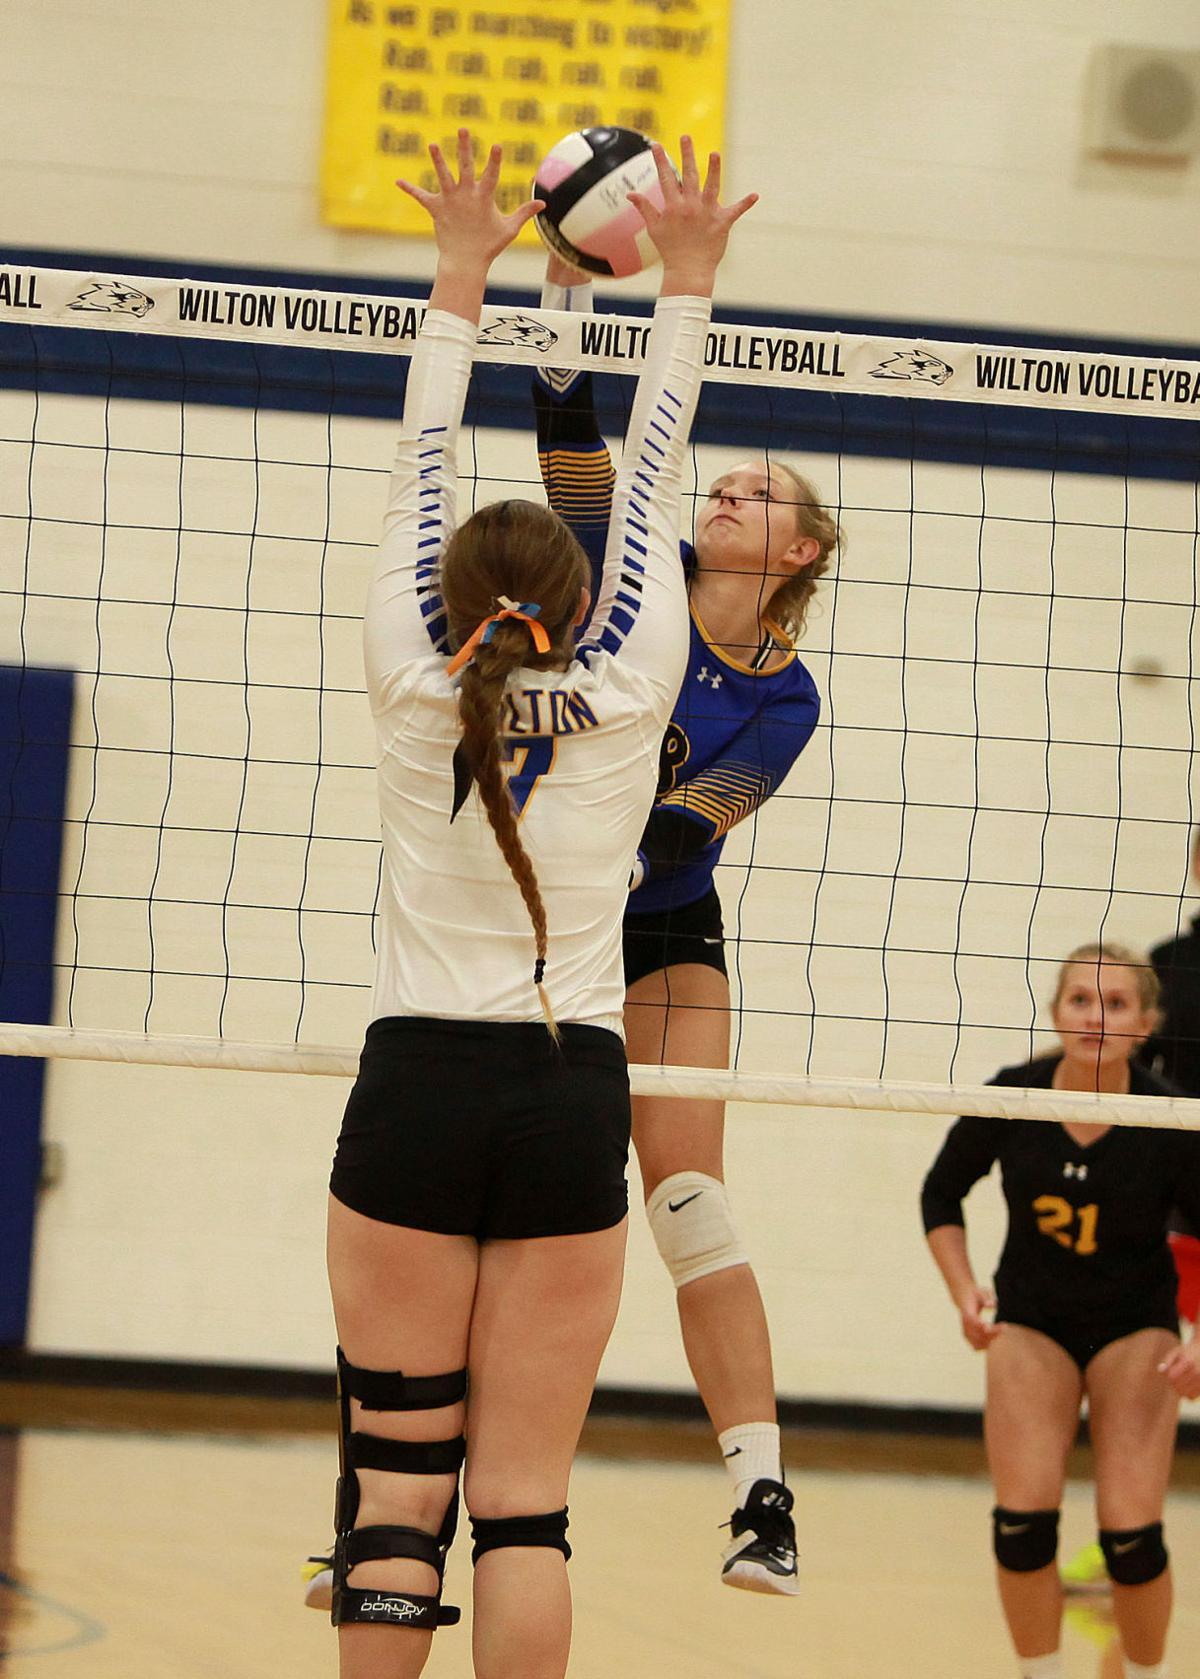 Wilton-Durant volleyball